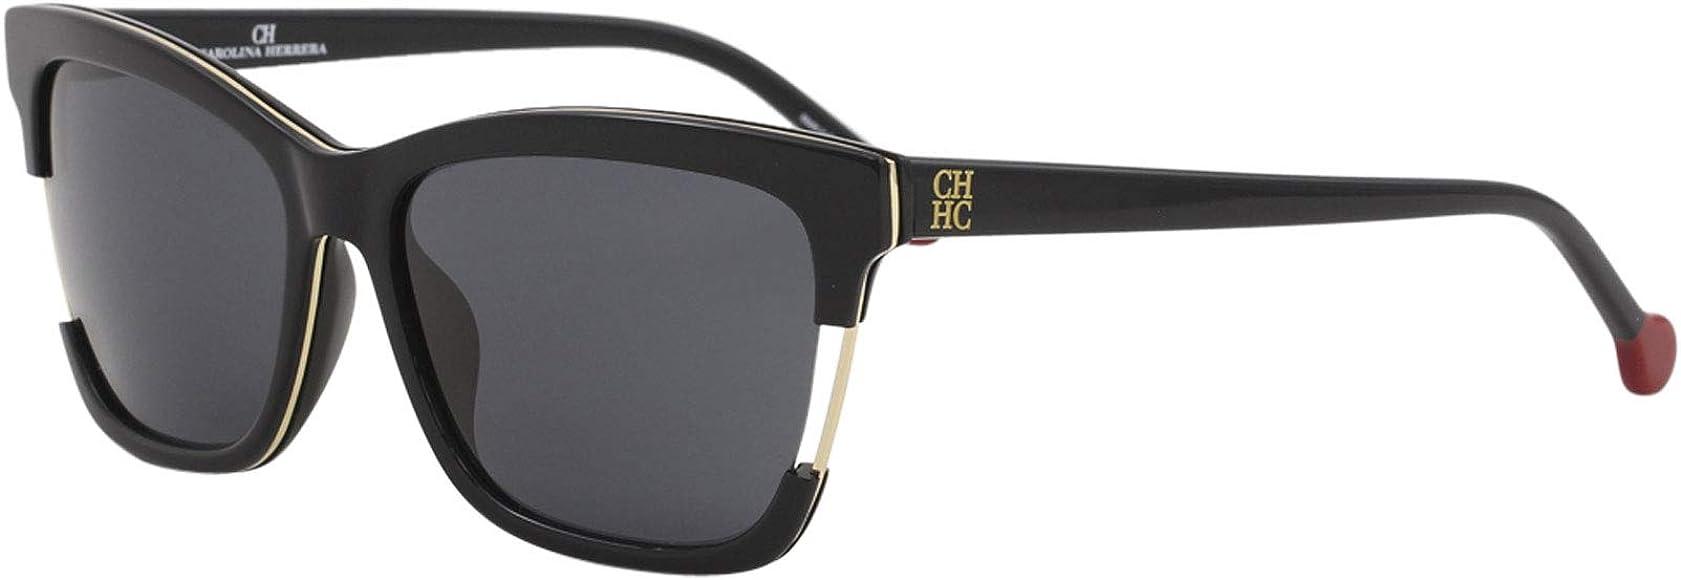 Amazon.com: CH Carolina SHE752 SHE/752 0700 Herrera - Gafas ...